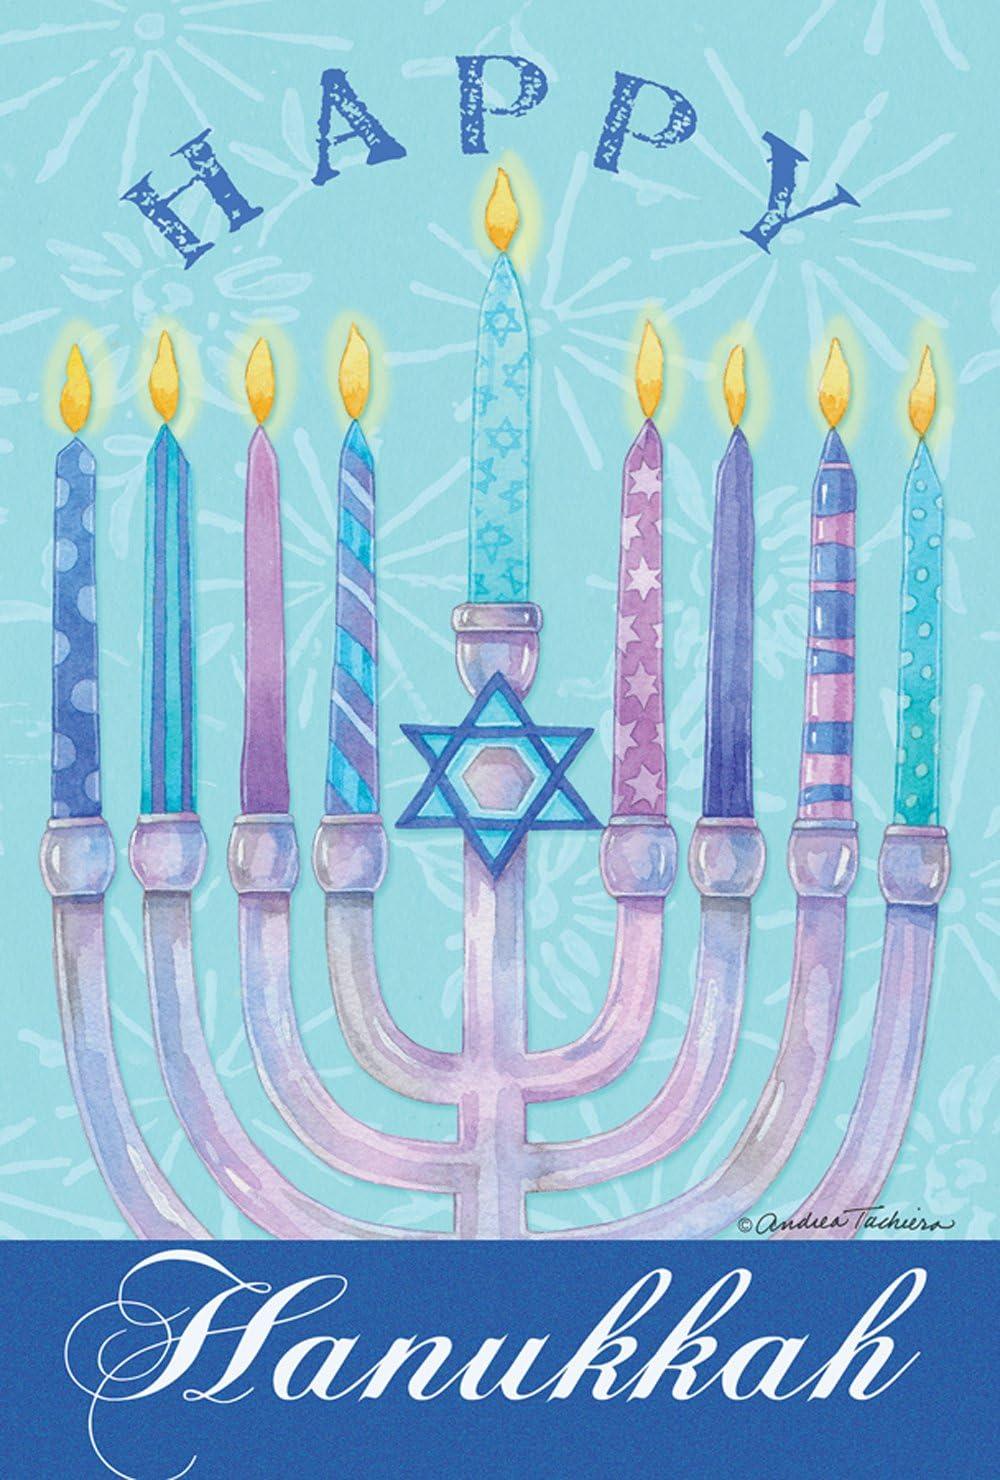 Toland Home Garden Happy Hanukkah 12.5 x 18 Inch Decorative Winter Holiday Menorah Garden Flag - 1110453